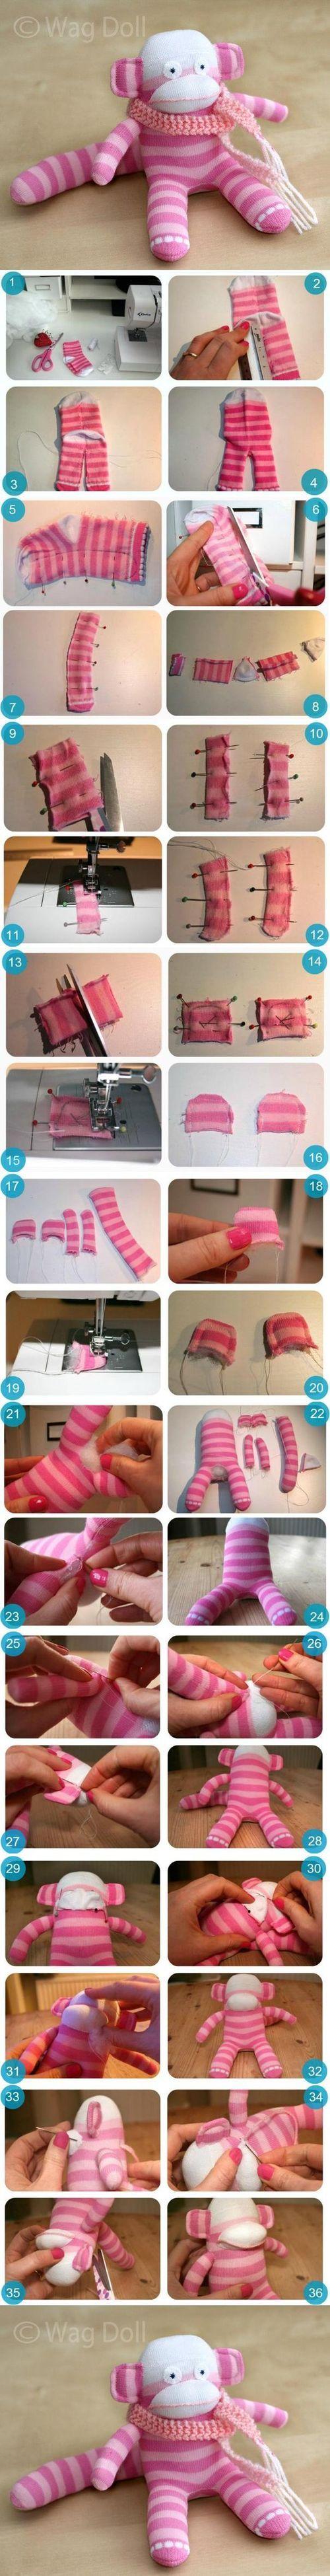 DIY Sock Monkey DIY Projects / UsefulDIY.com